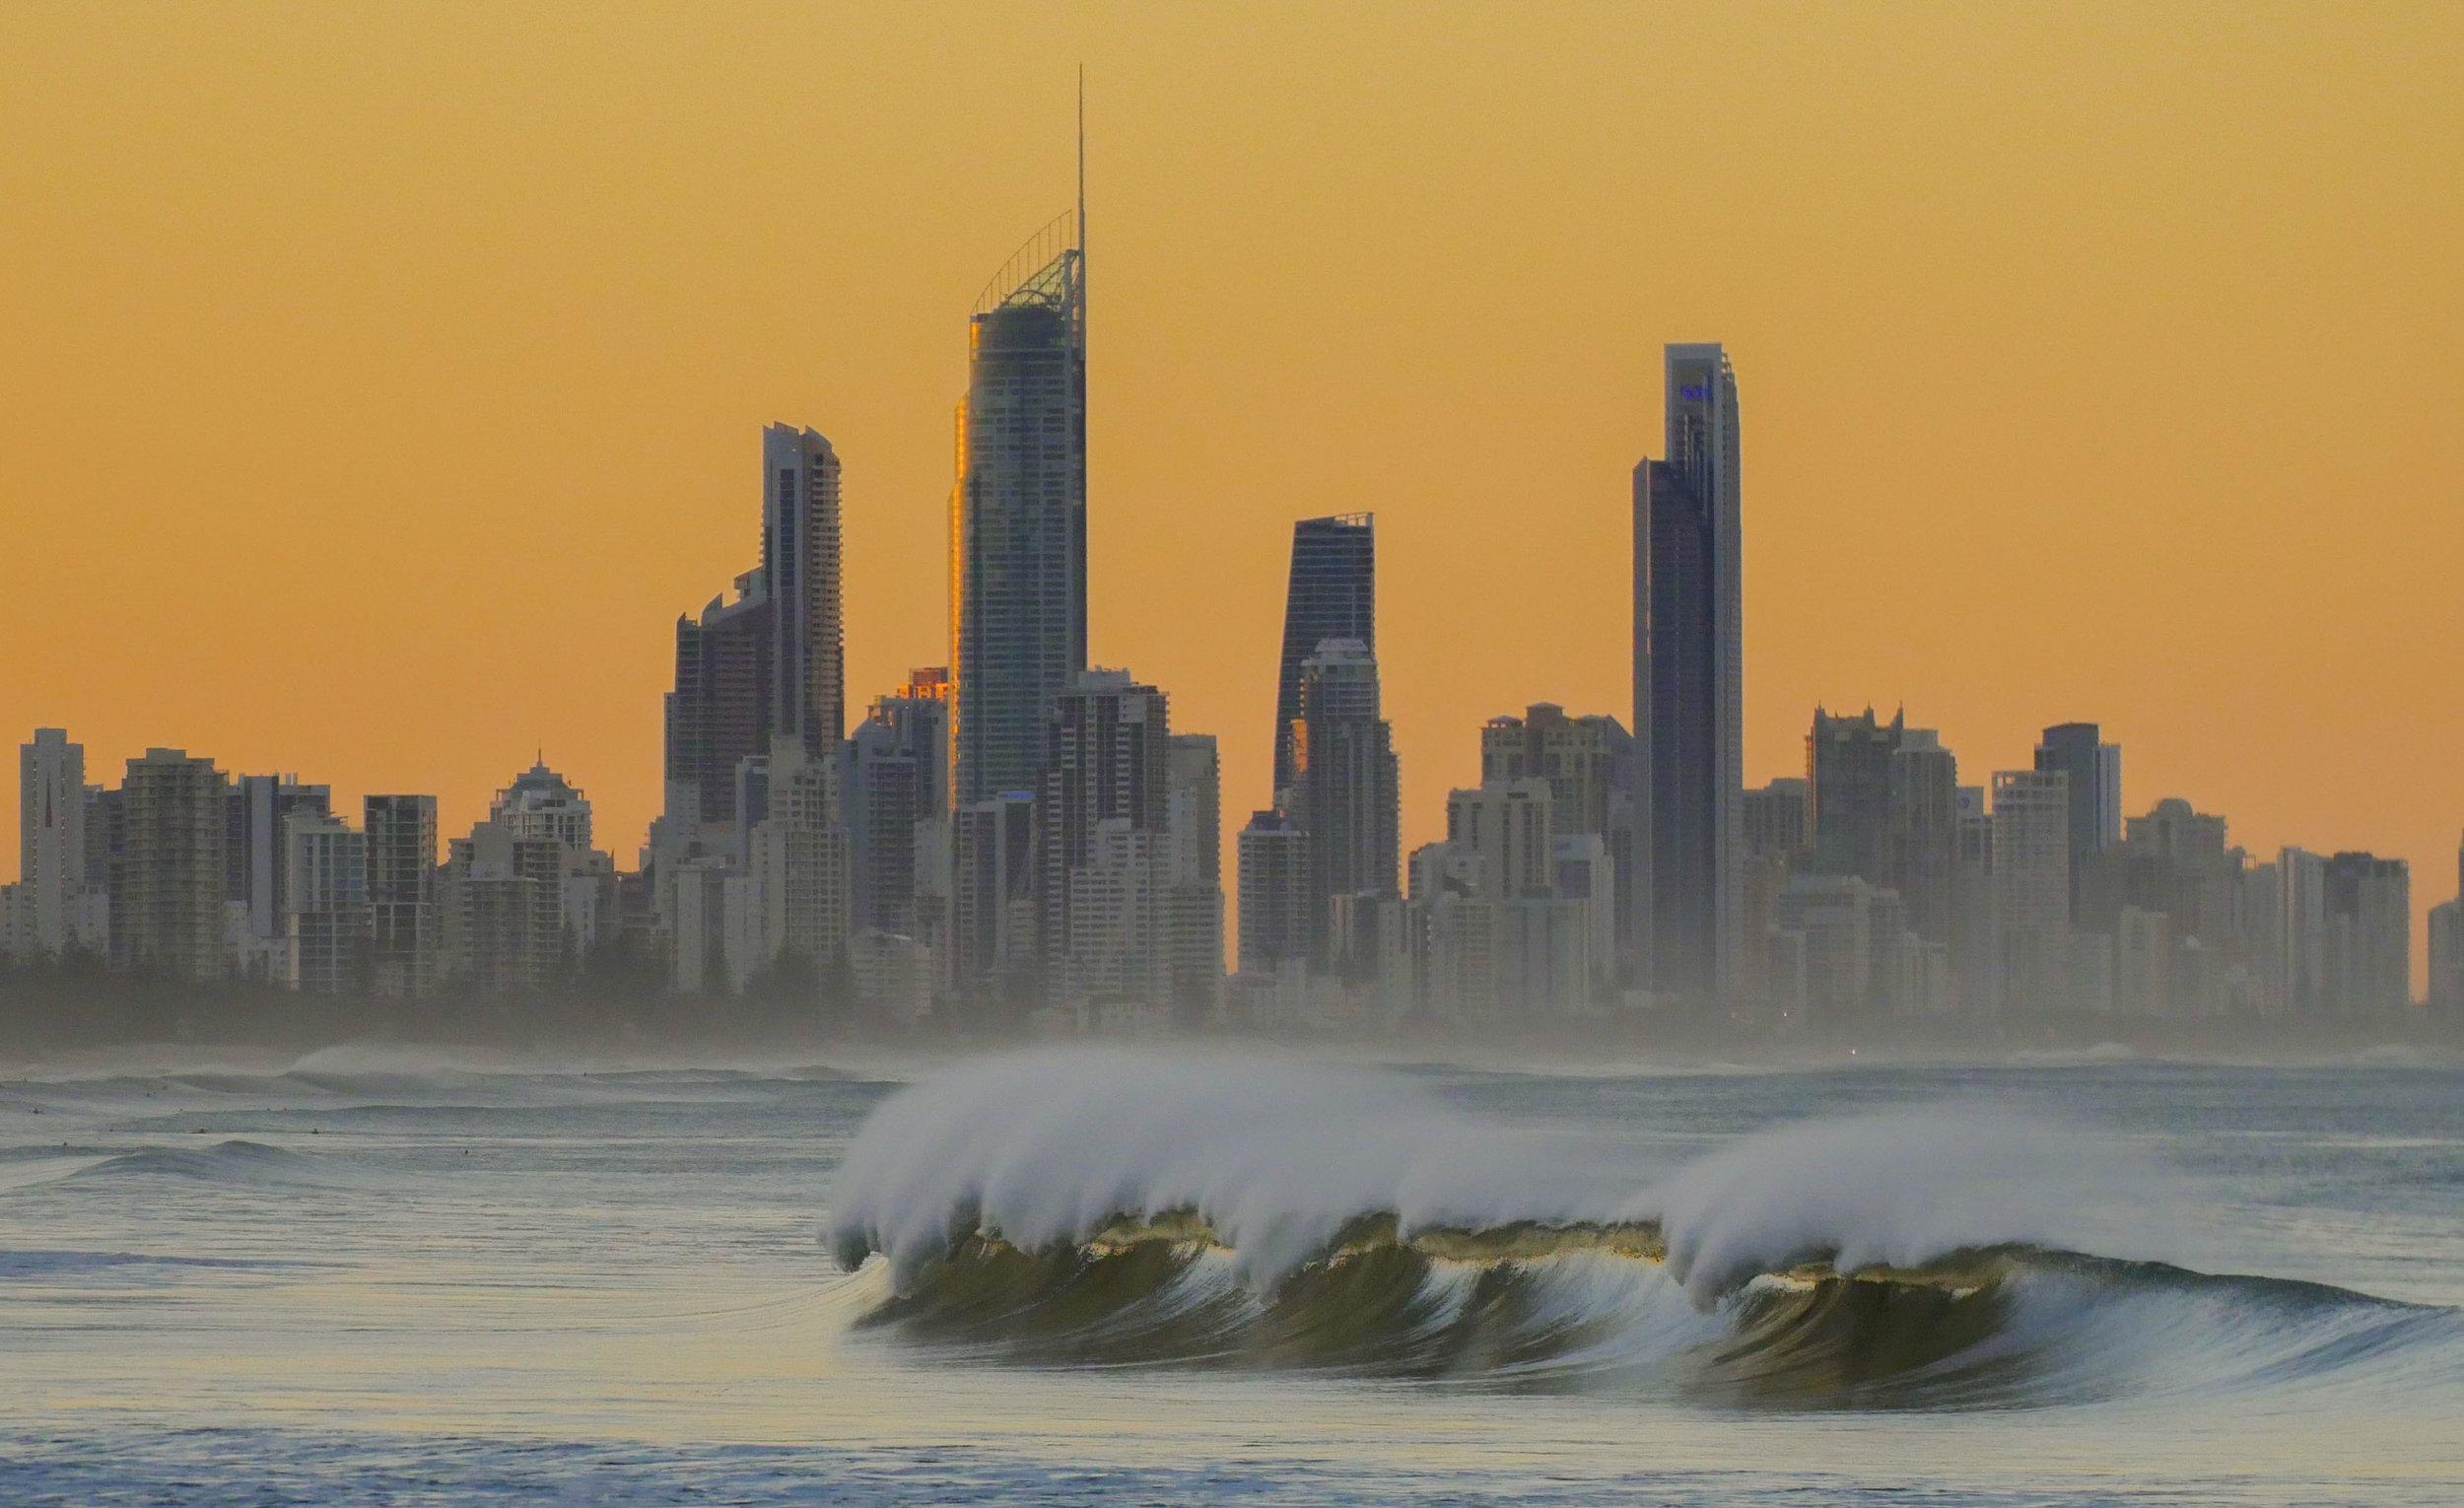 Gold Coast Australia Work Visa Travel Backpacker